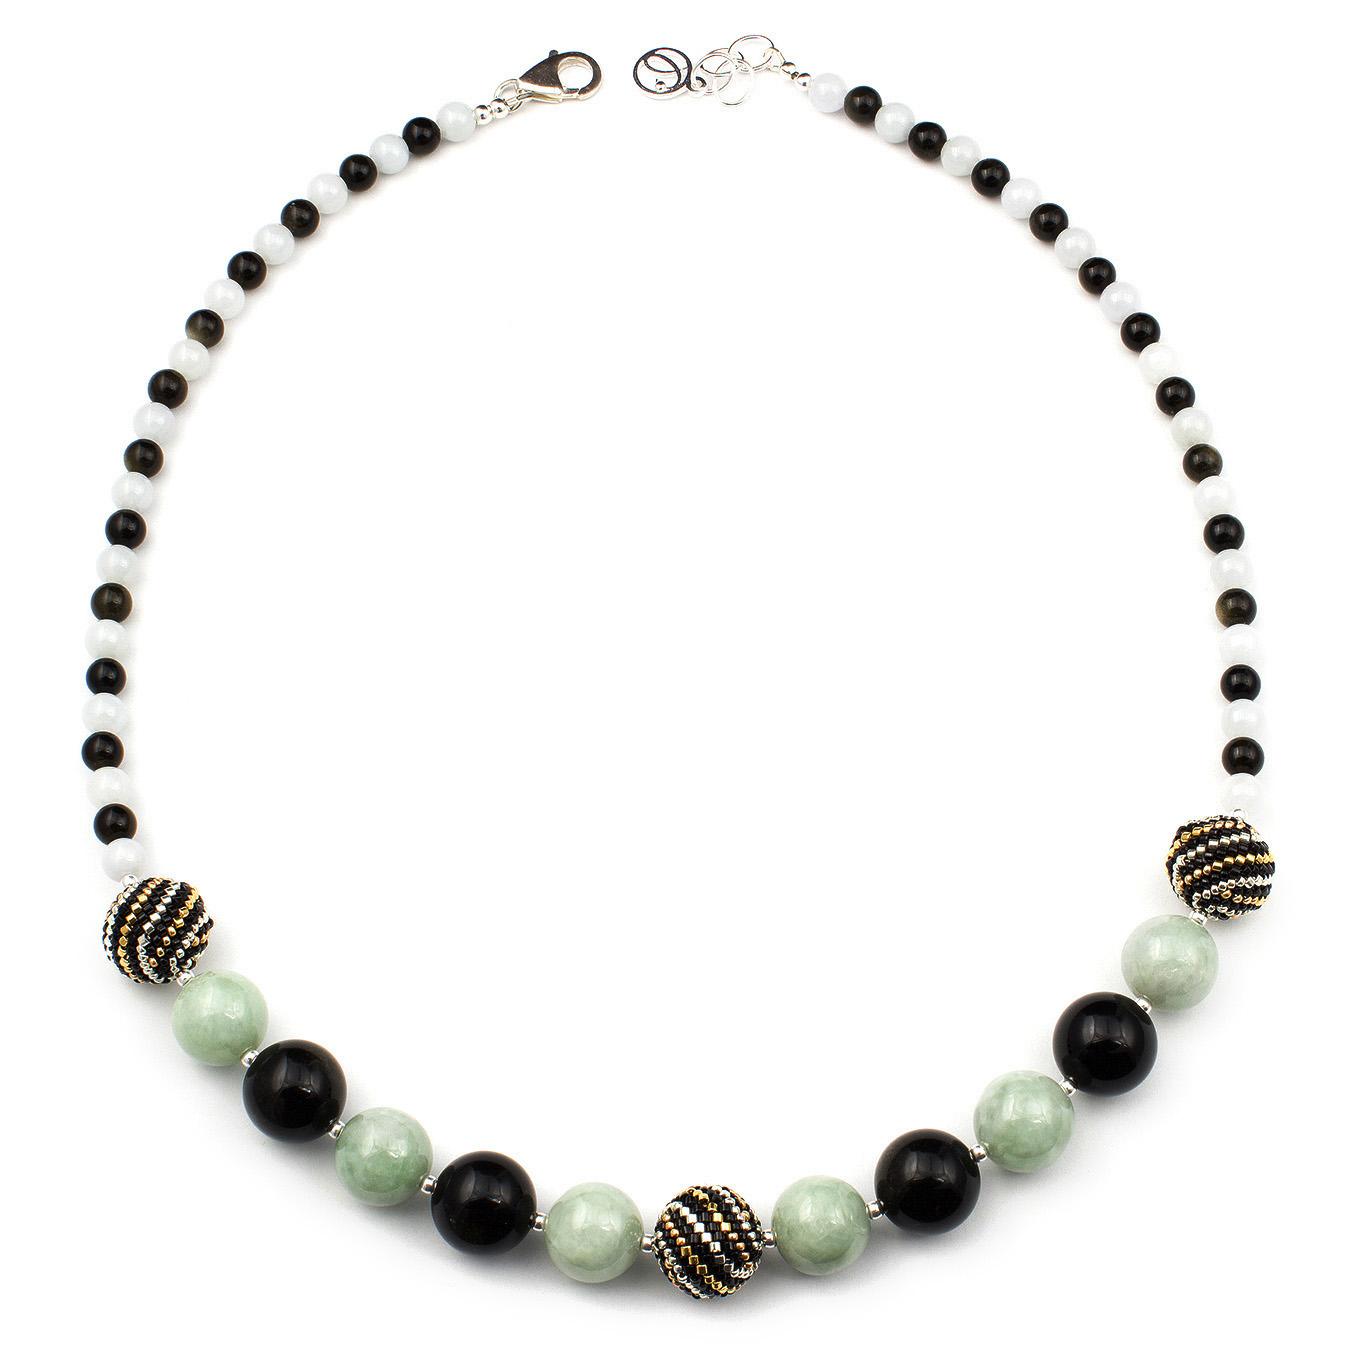 Personalized artisan miyuki pendant necklace using multi-color stones